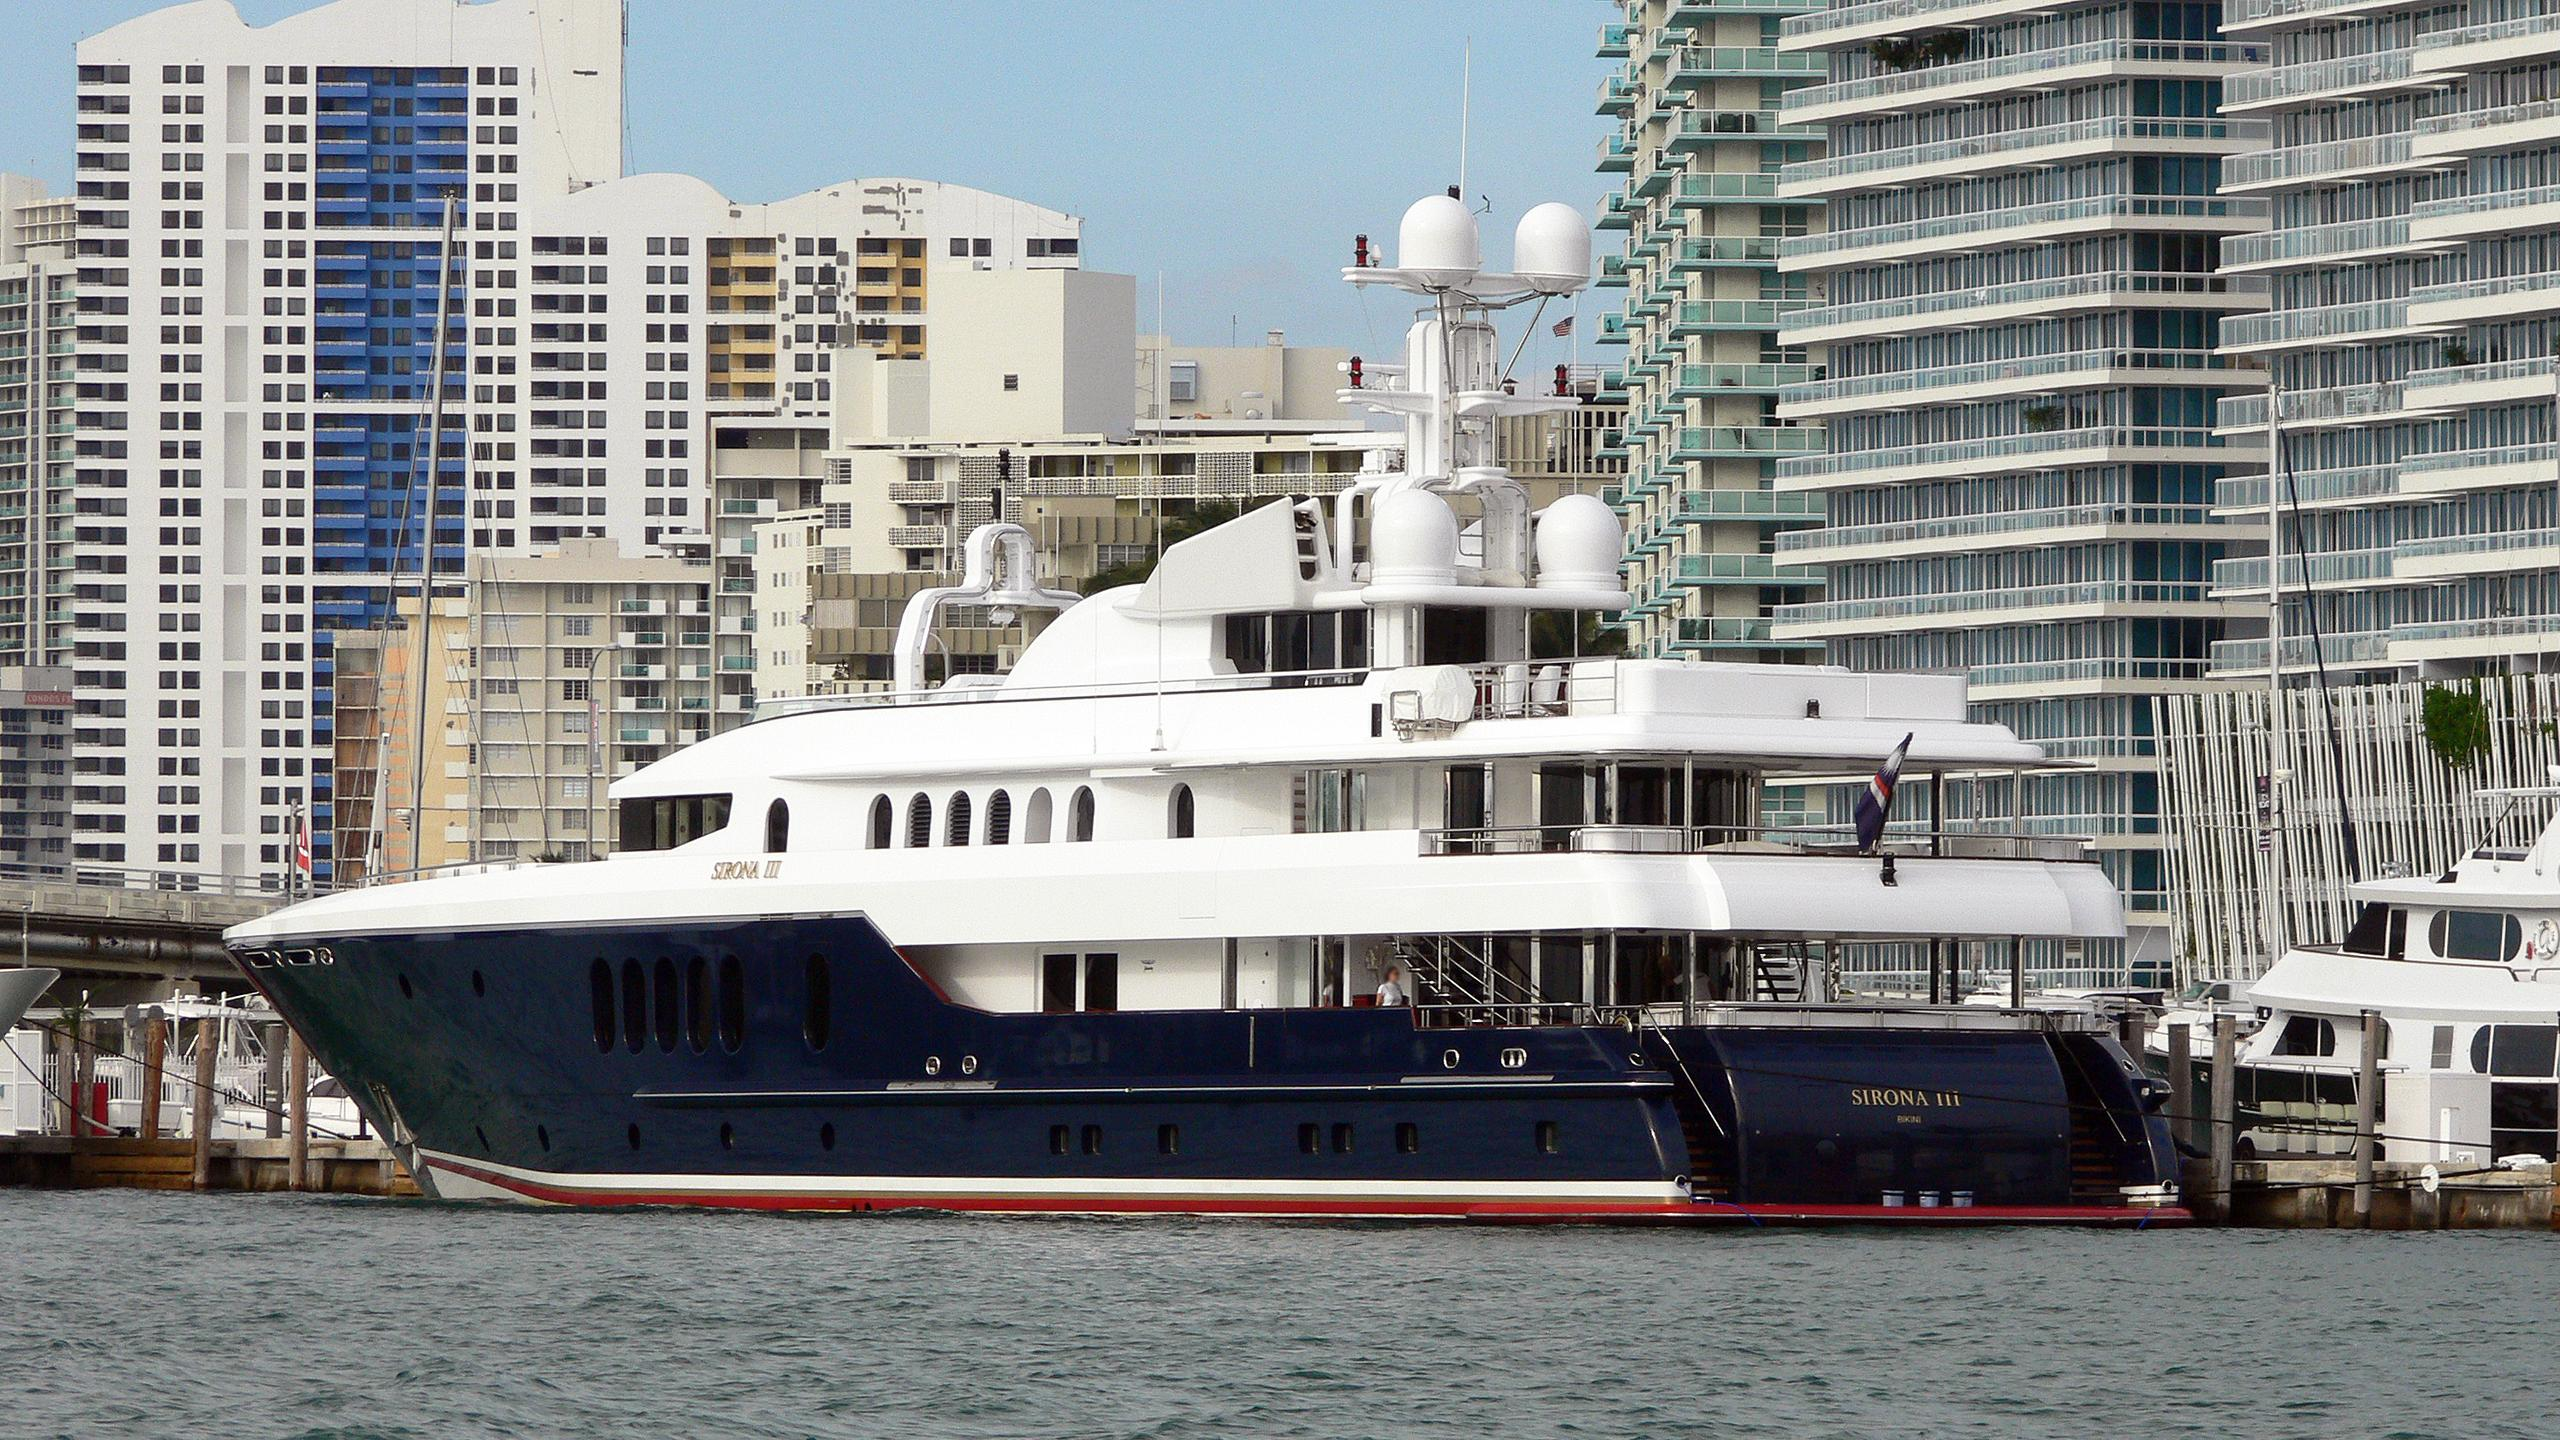 sirona-iii-motor-yacht-oceanfast-2004-56m-half-profile-stern